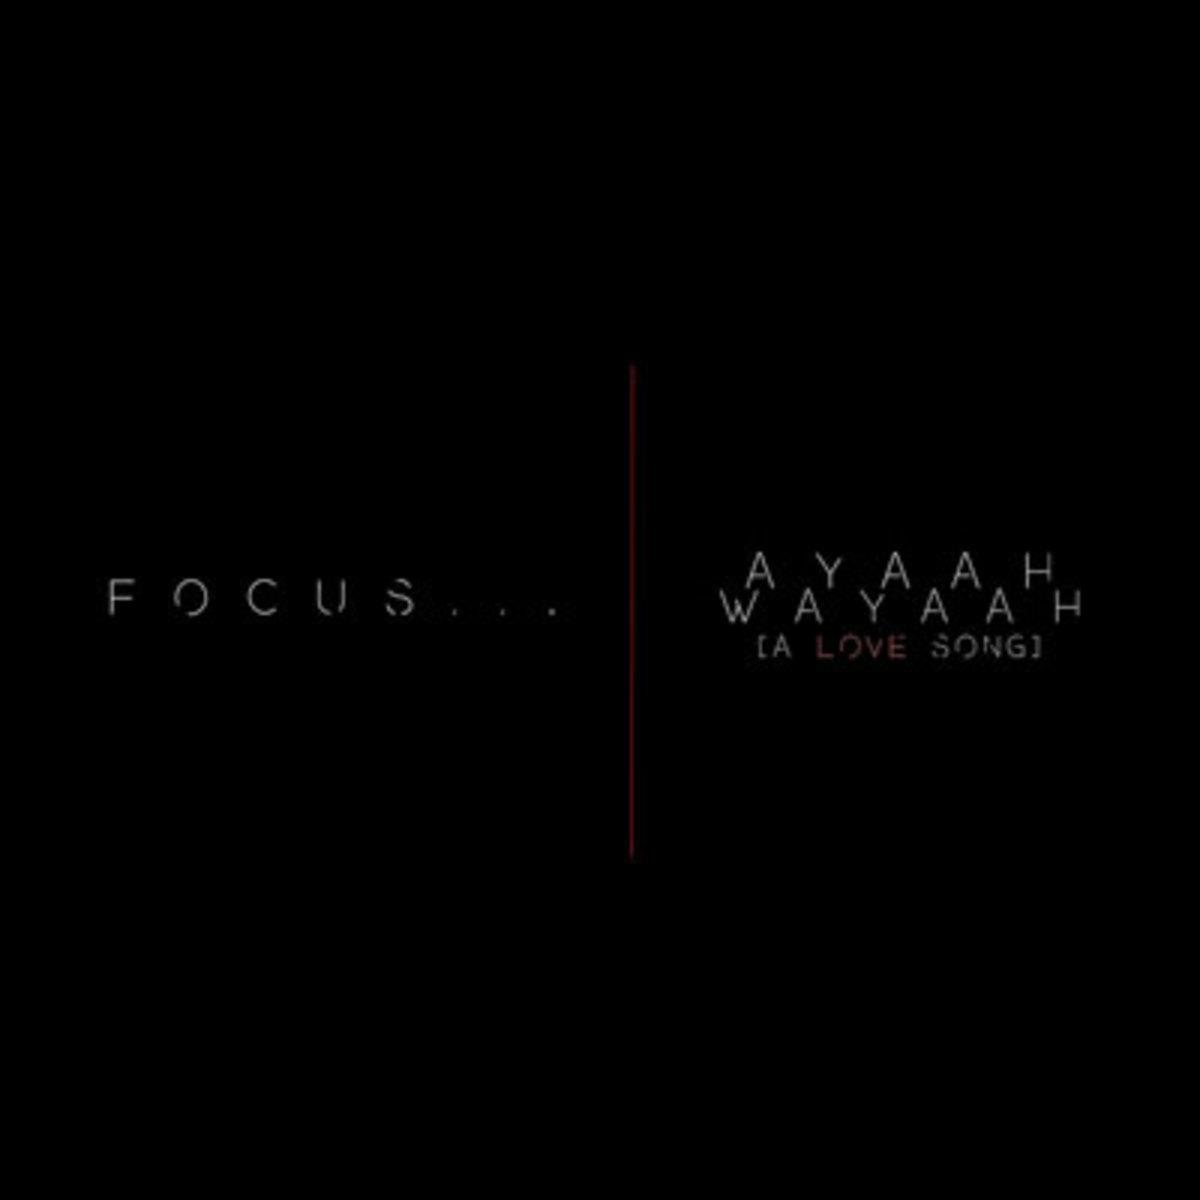 focus-alovesong.jpg